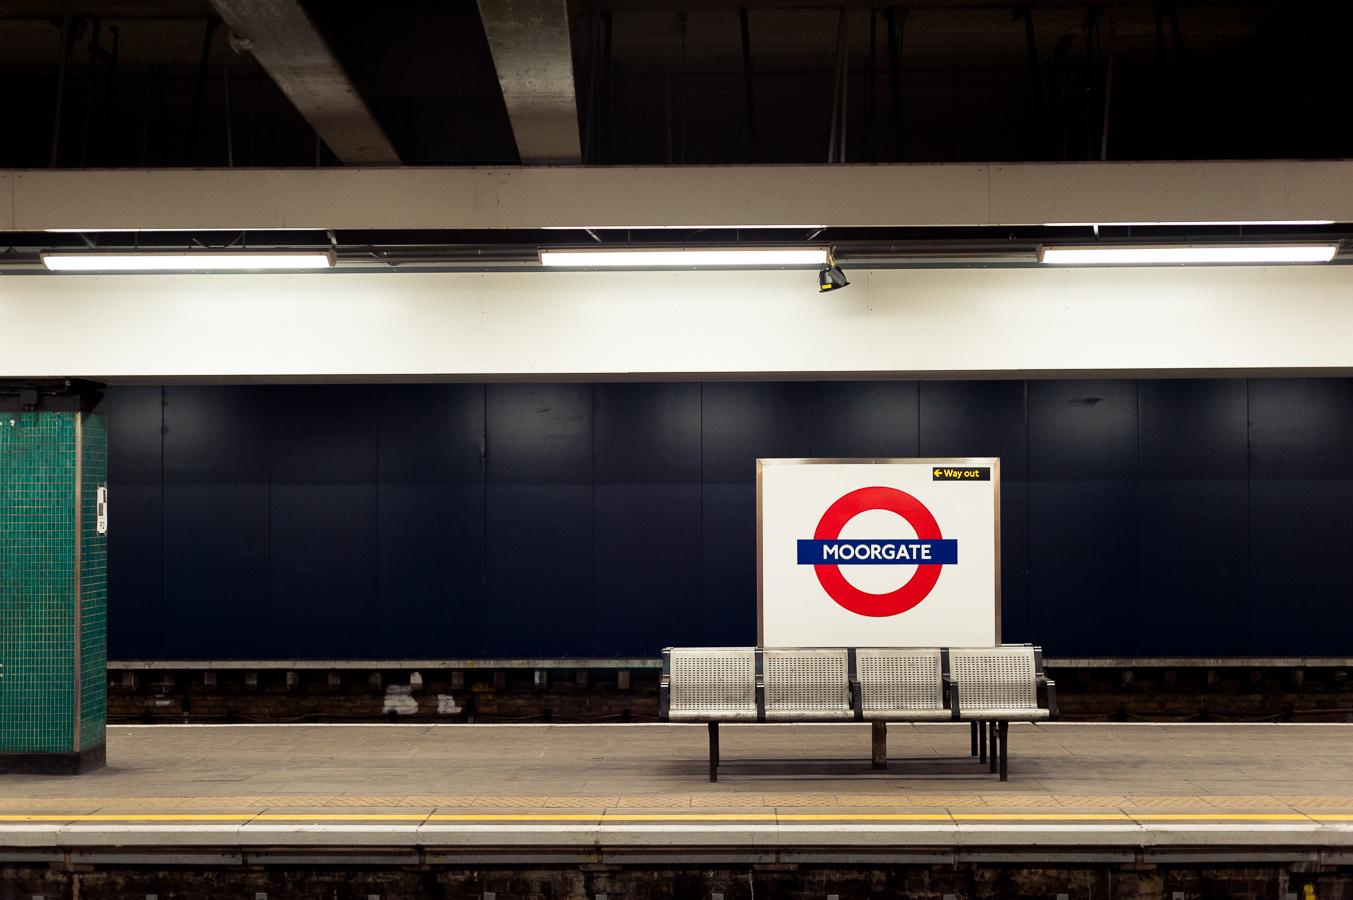 moorgate-tube-station-platform.jpg